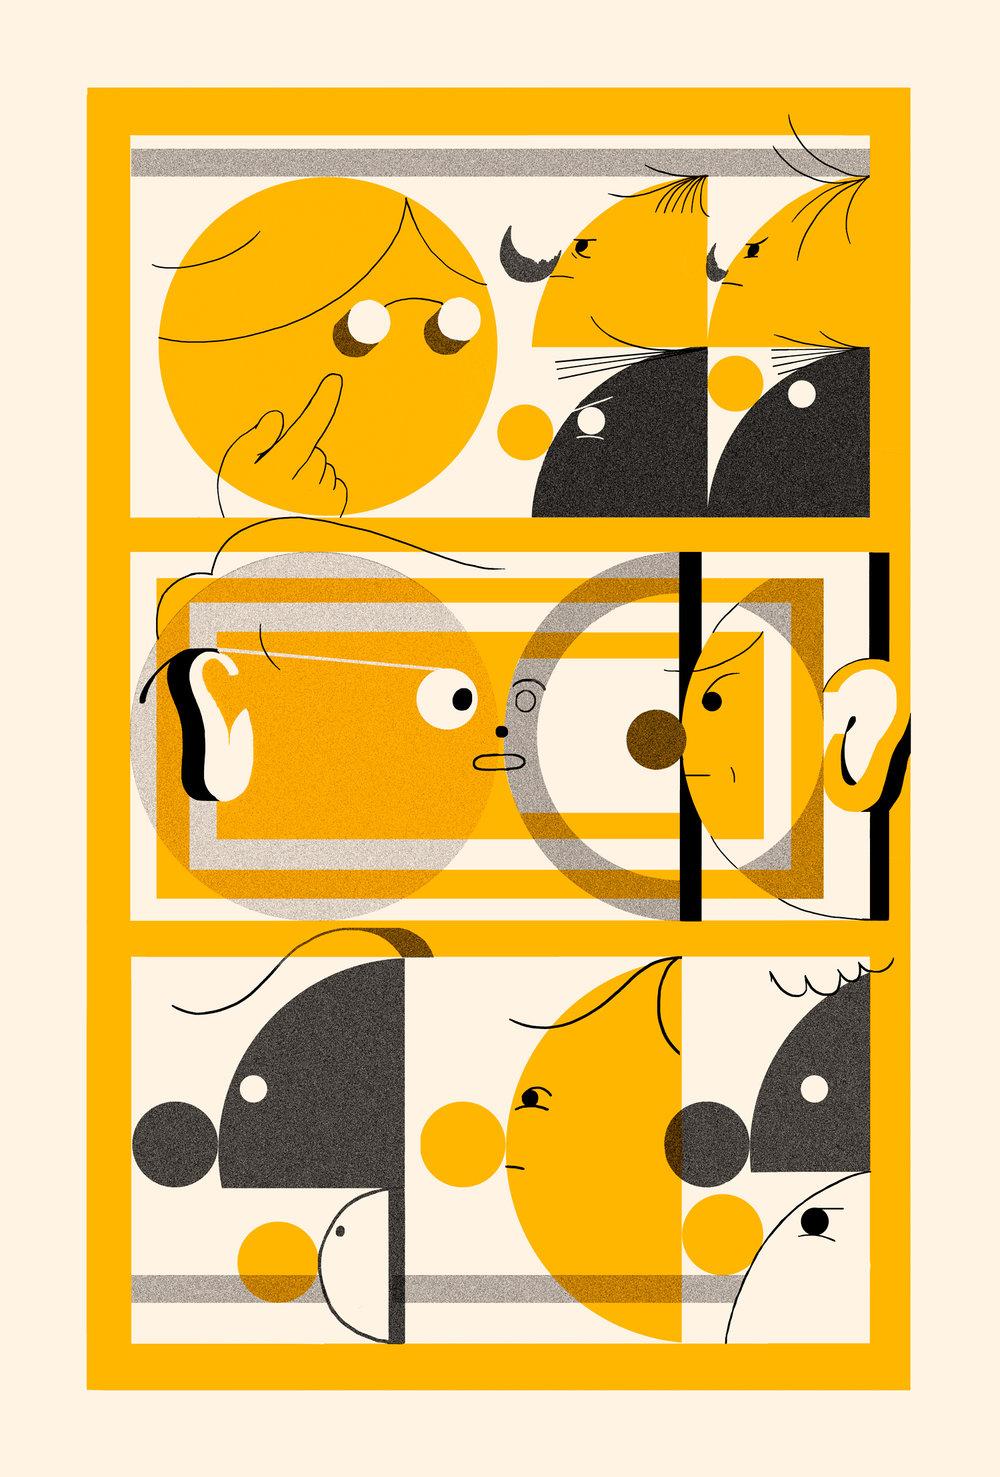 "The Conversation - Risograph, 11x17"", 2017"